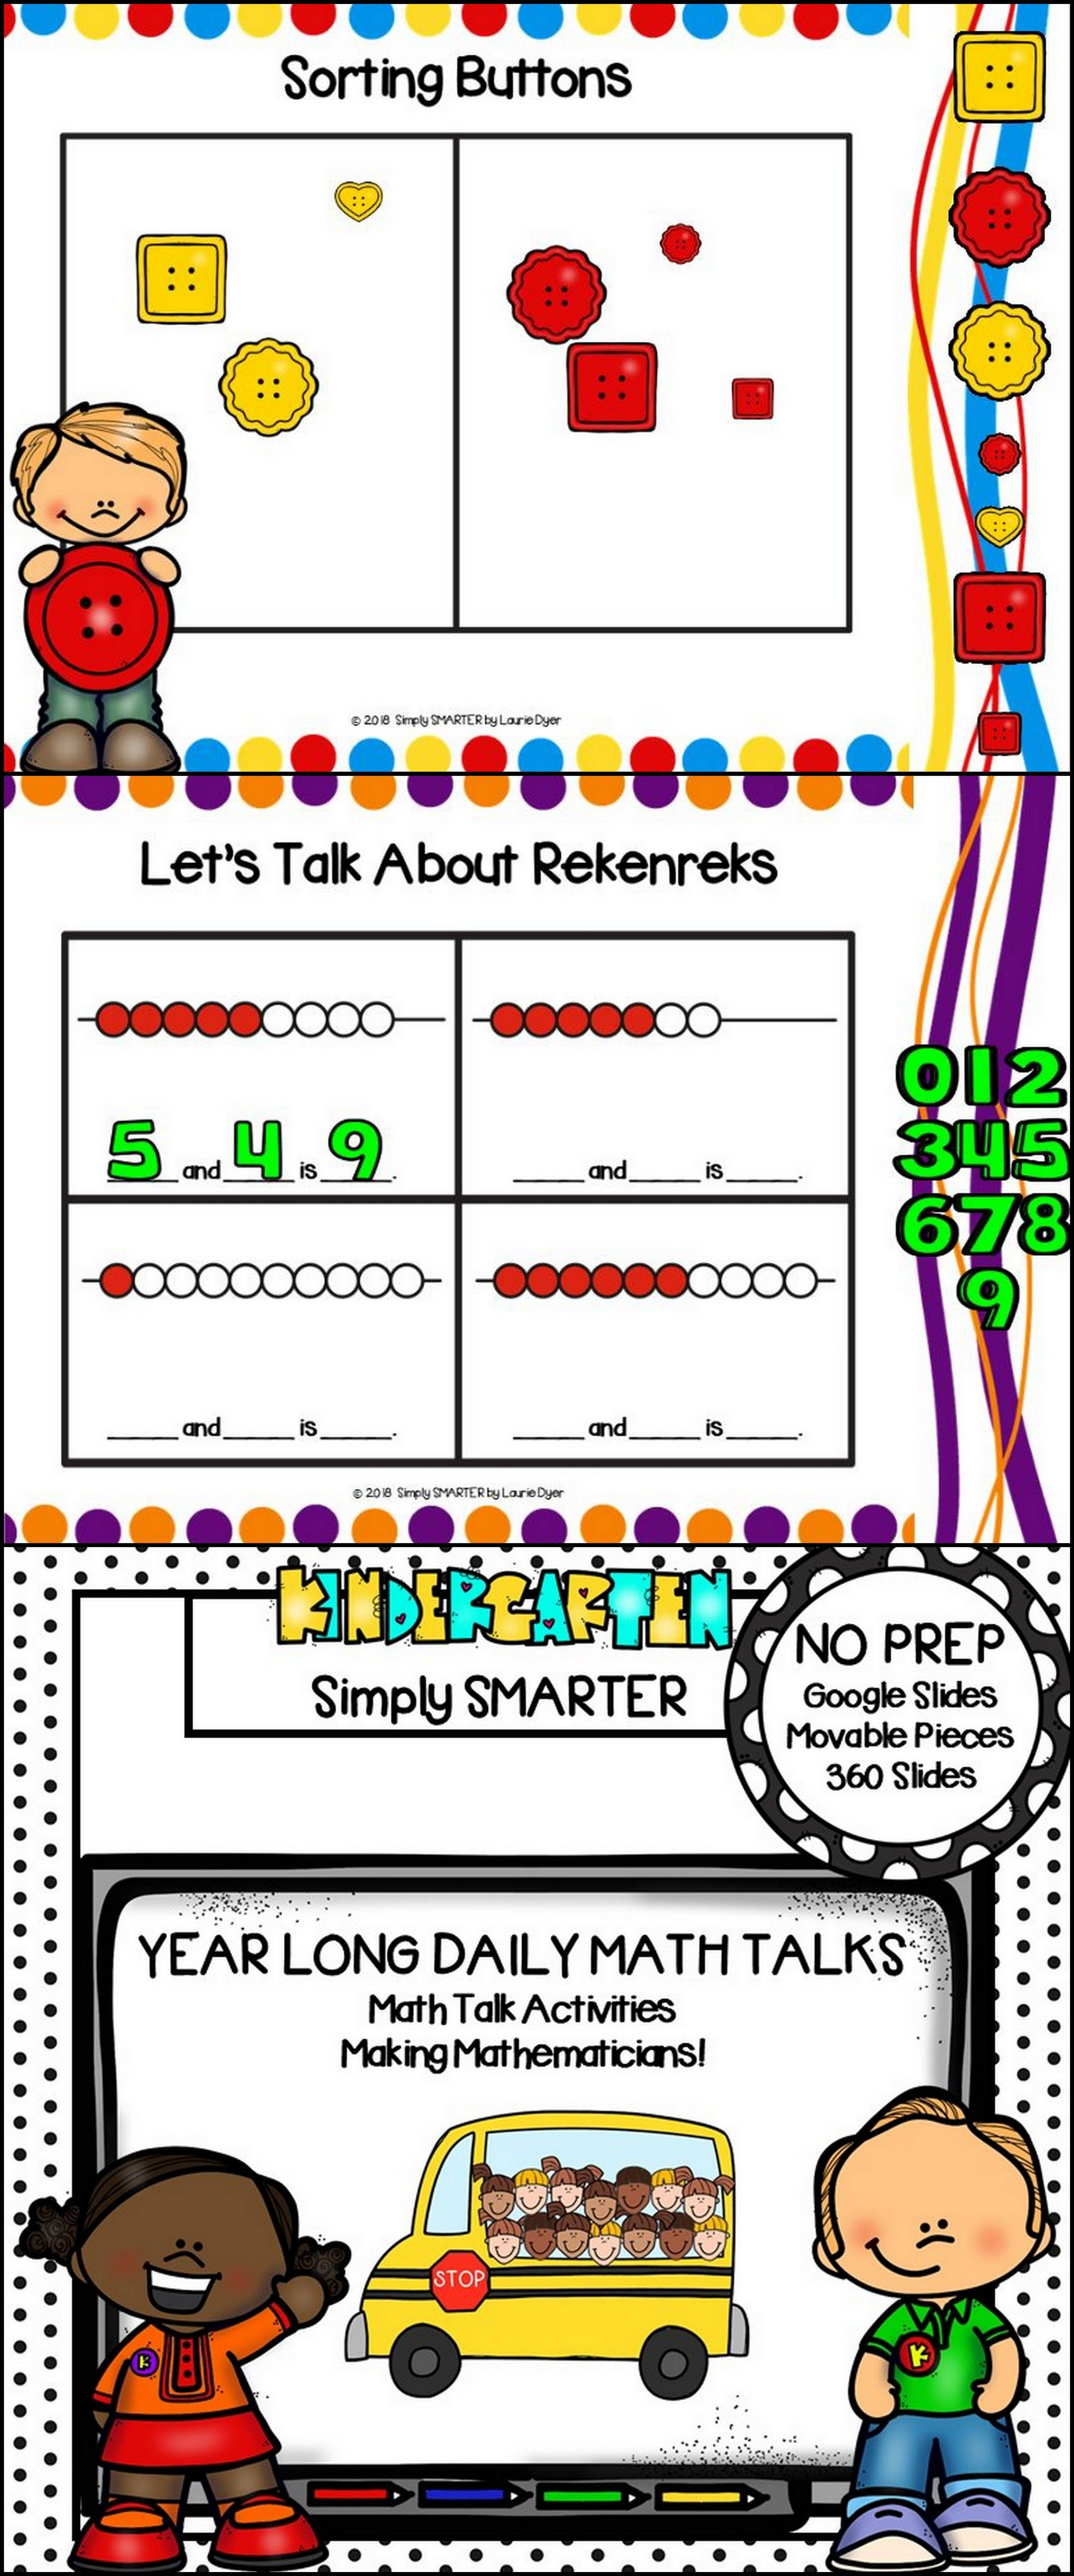 Kindergarten Digital Daily Math Talks For GOOGLE SLIDES Year Long ...